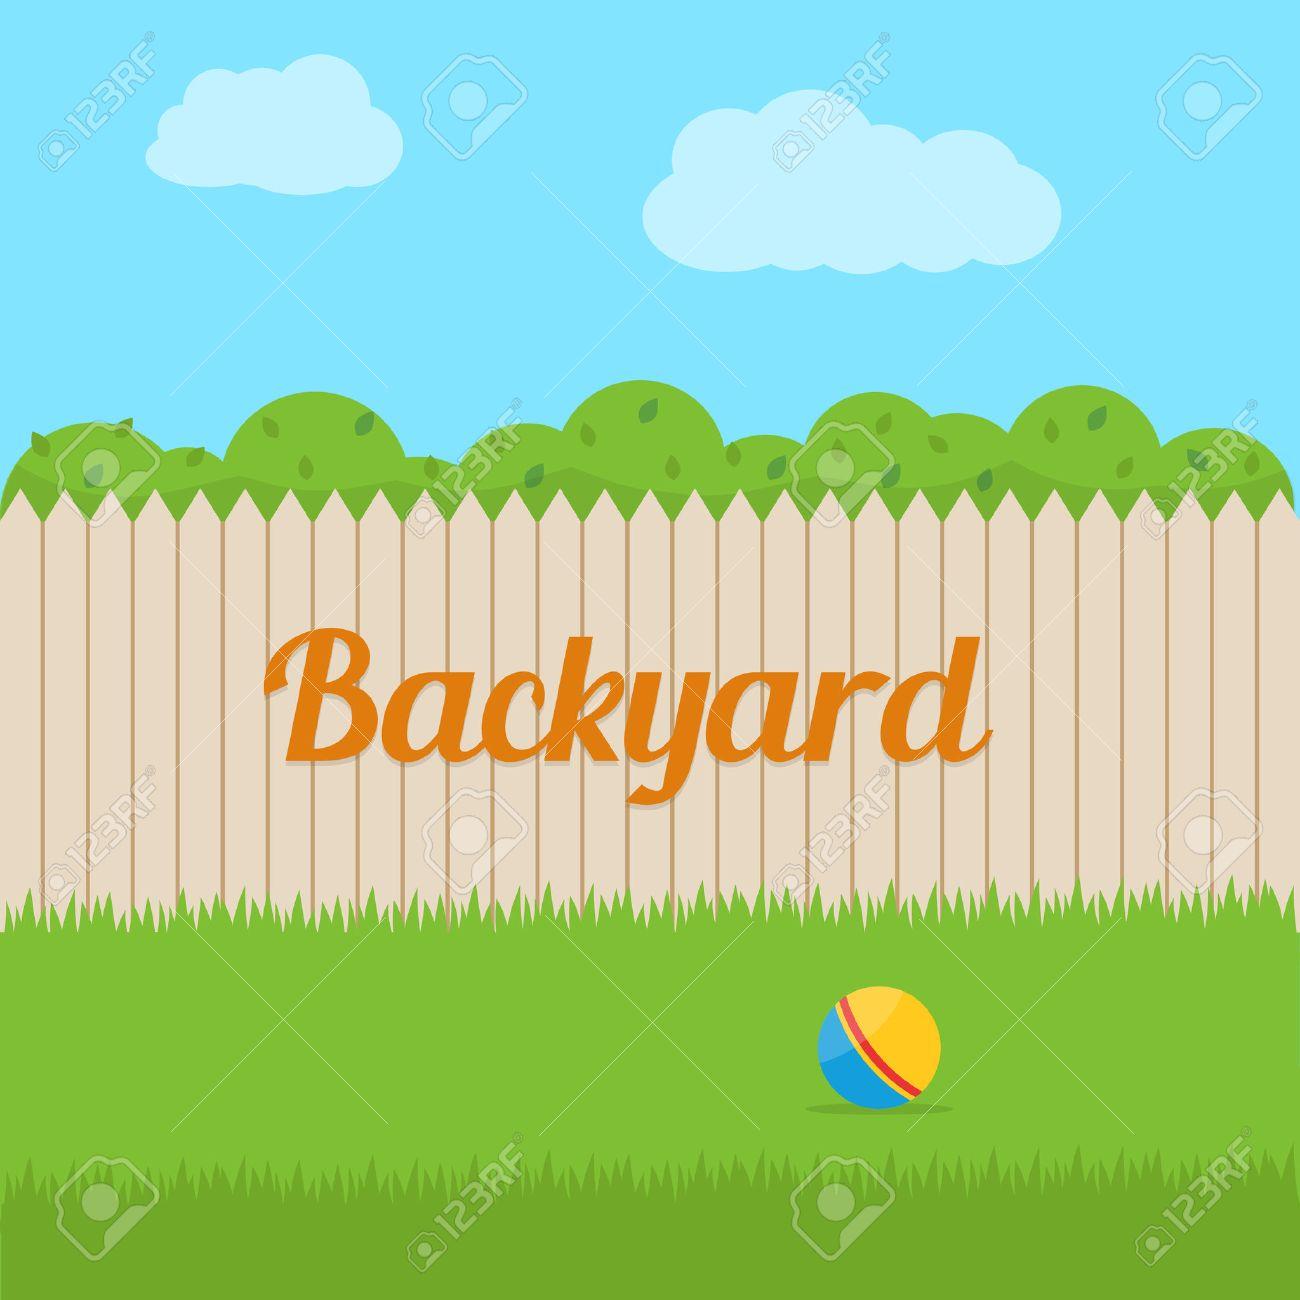 Backyard of house. Flat style vector illustration. - 52617179